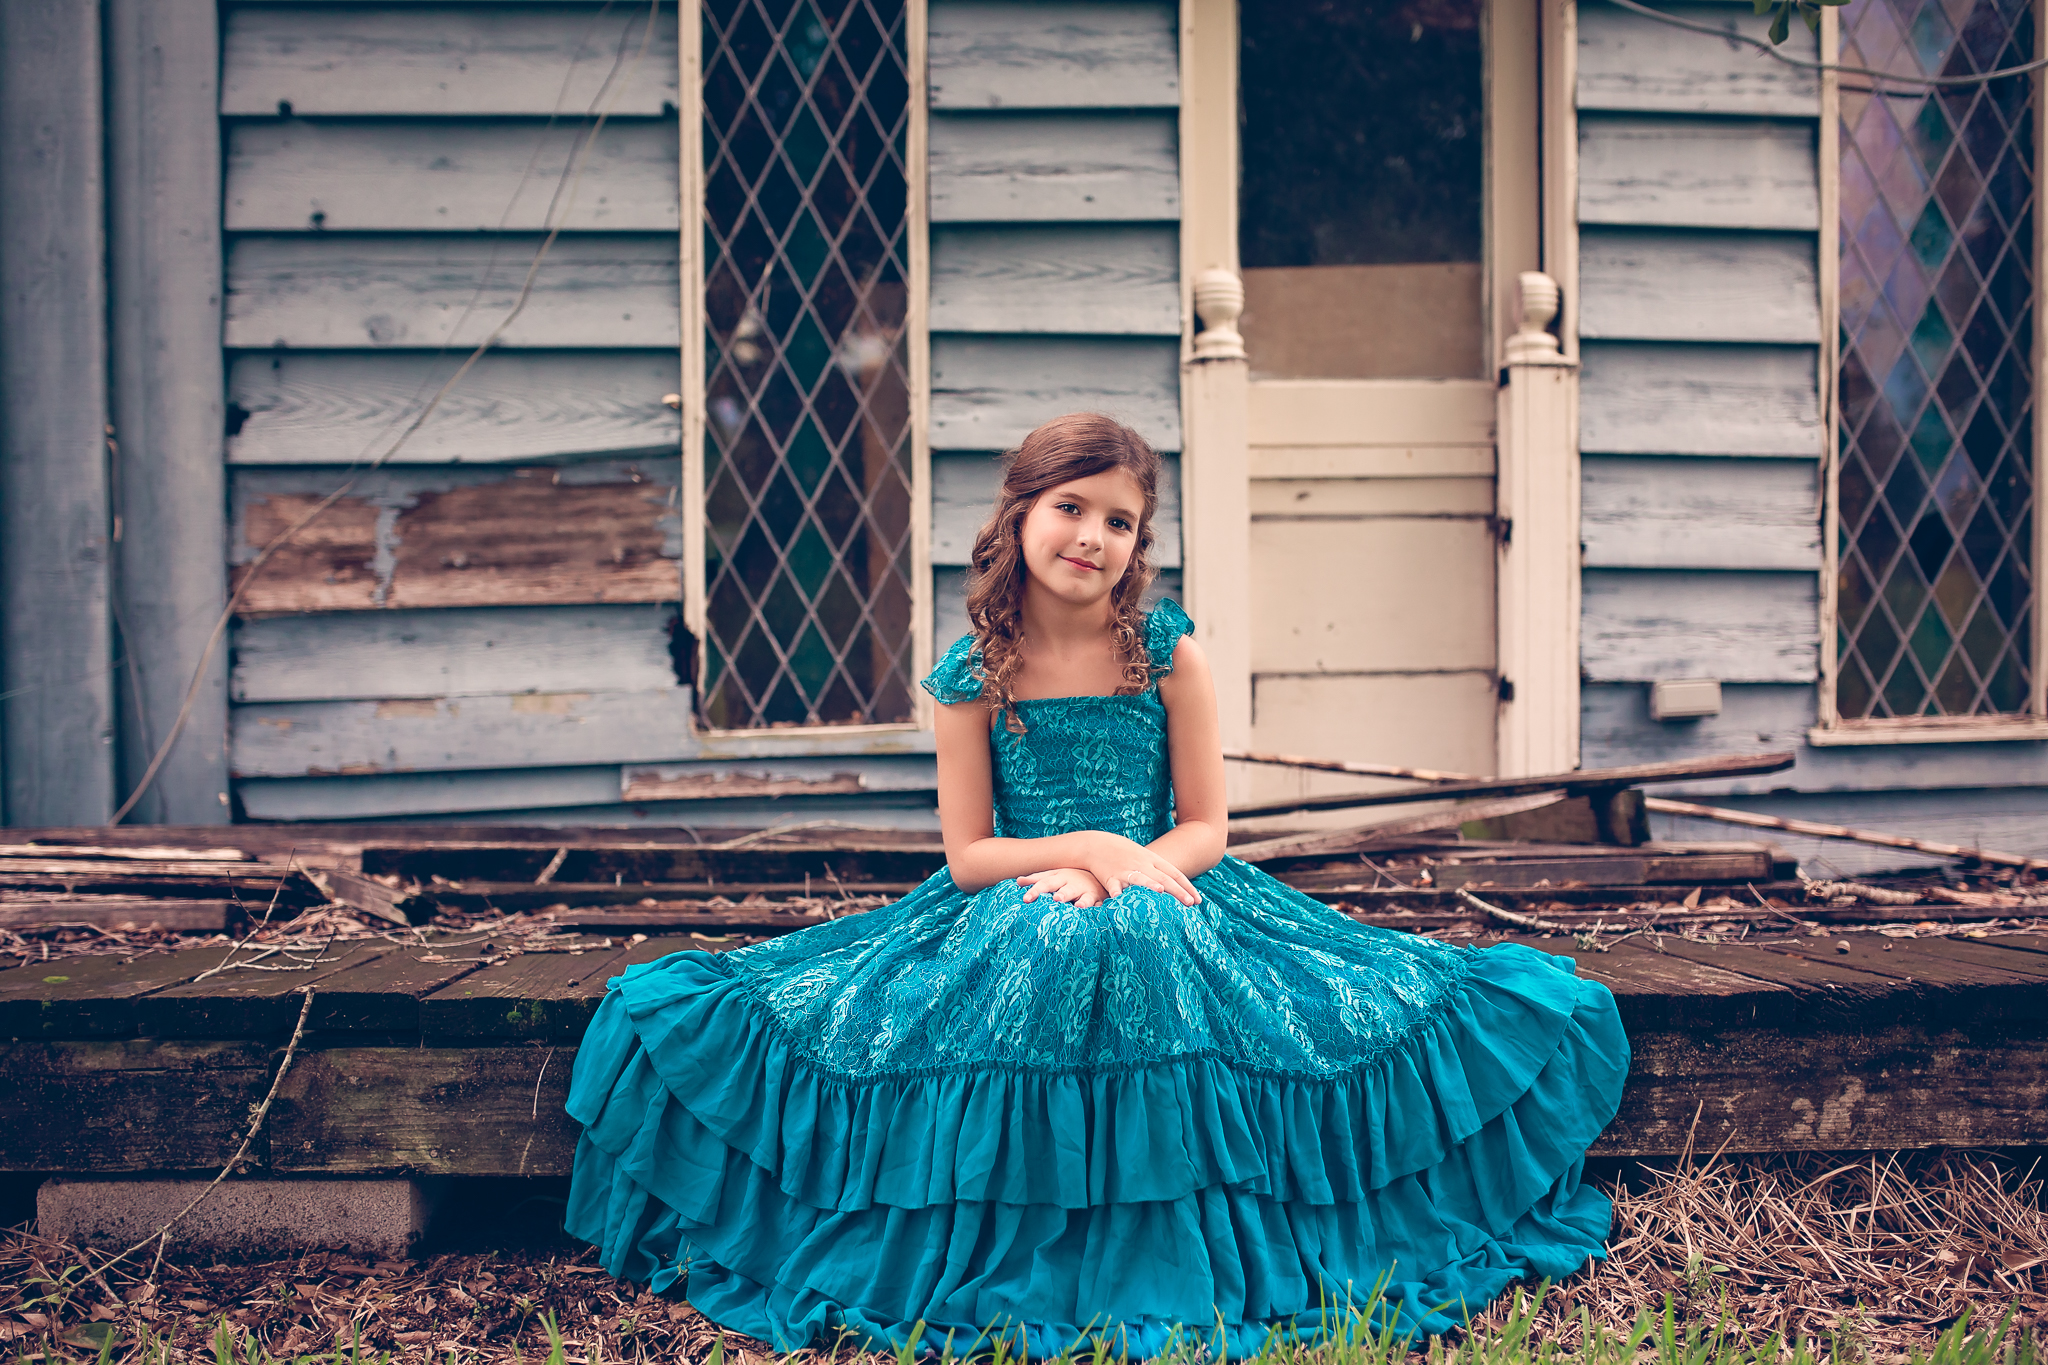 houston-tx-katy-sugar-land-woodlands-richmond-child-portrait-photographer-outdoor-princess-photoshoot.jpg